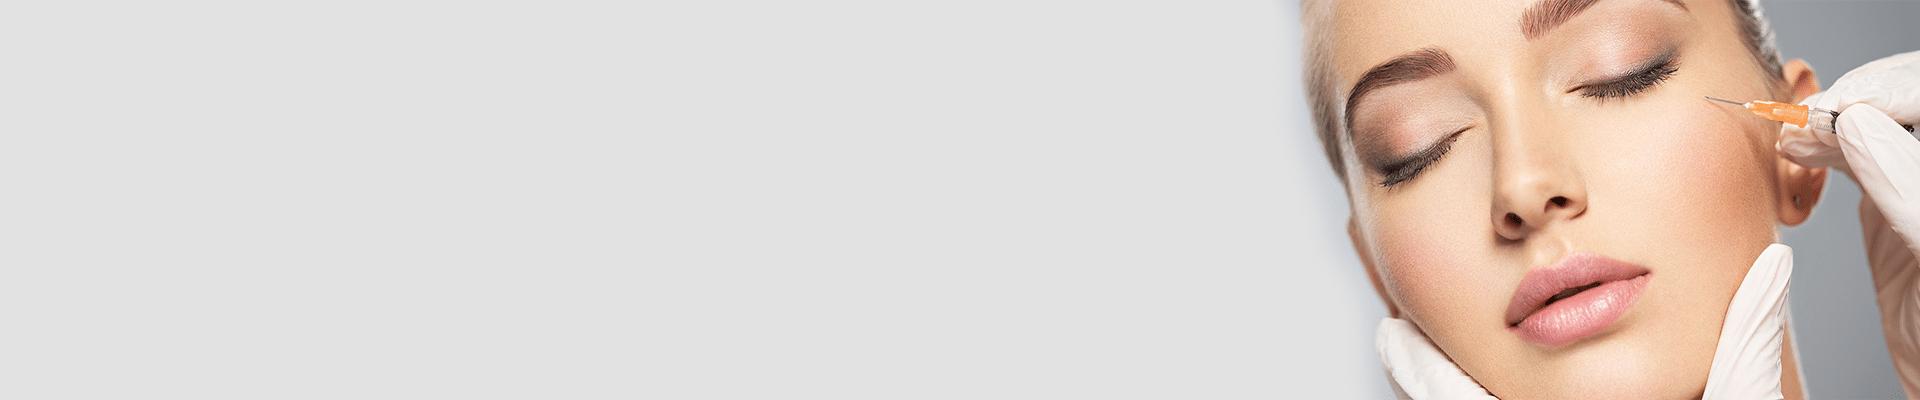 [:fr]Injection Botox Nabeul : rajeunissement du visage et traitement rides pas cher[:ar]حقن البوتوكس في نابل : تجديد شباب الوجه وعلاج التجاعيد رخيص [:]